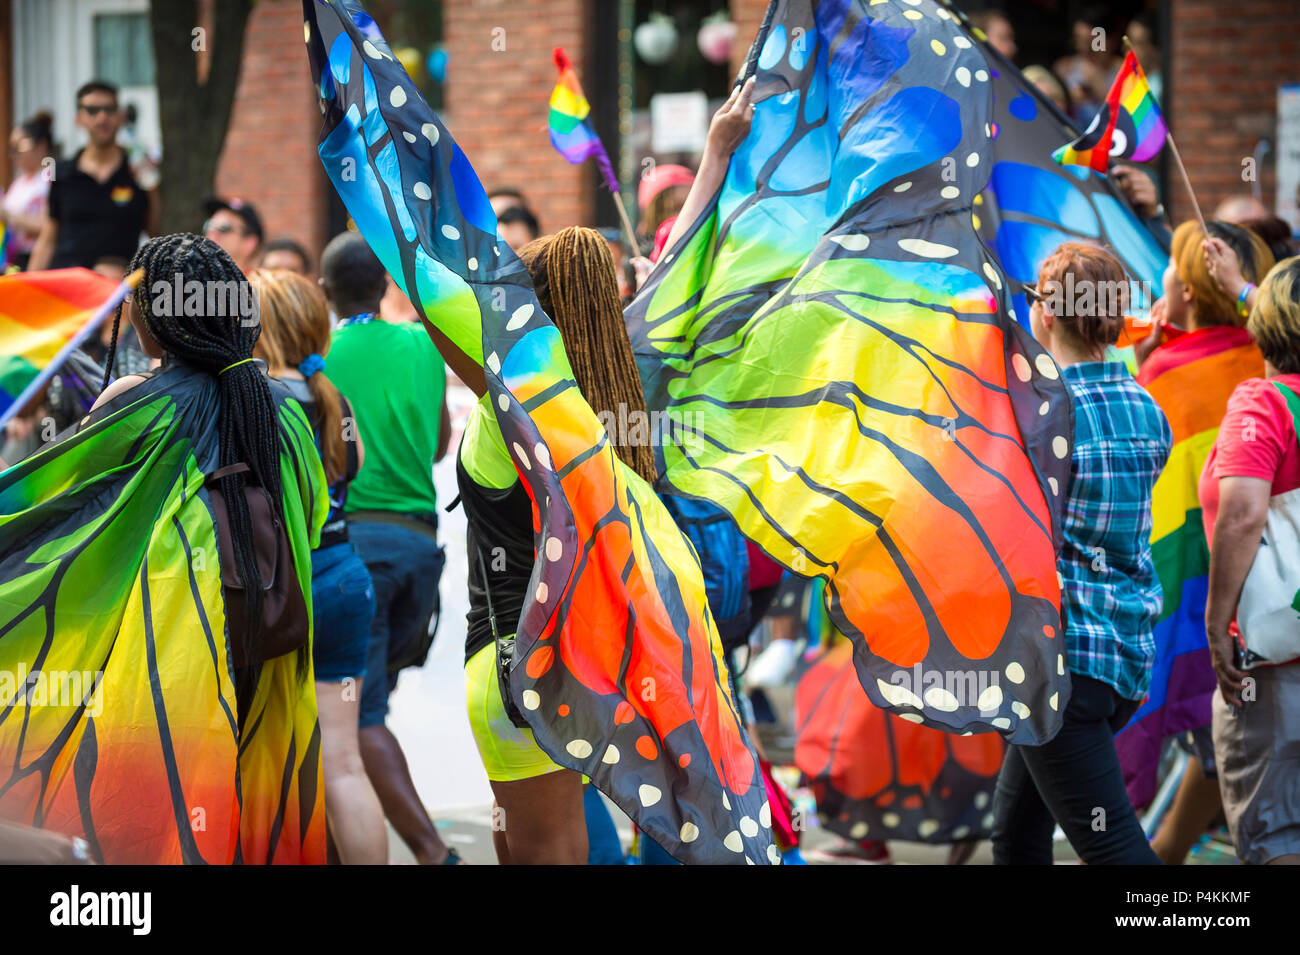 Rainbow Feather Angel Wings Halloween Gay LGBT Pride Party Festival Fancy Dress